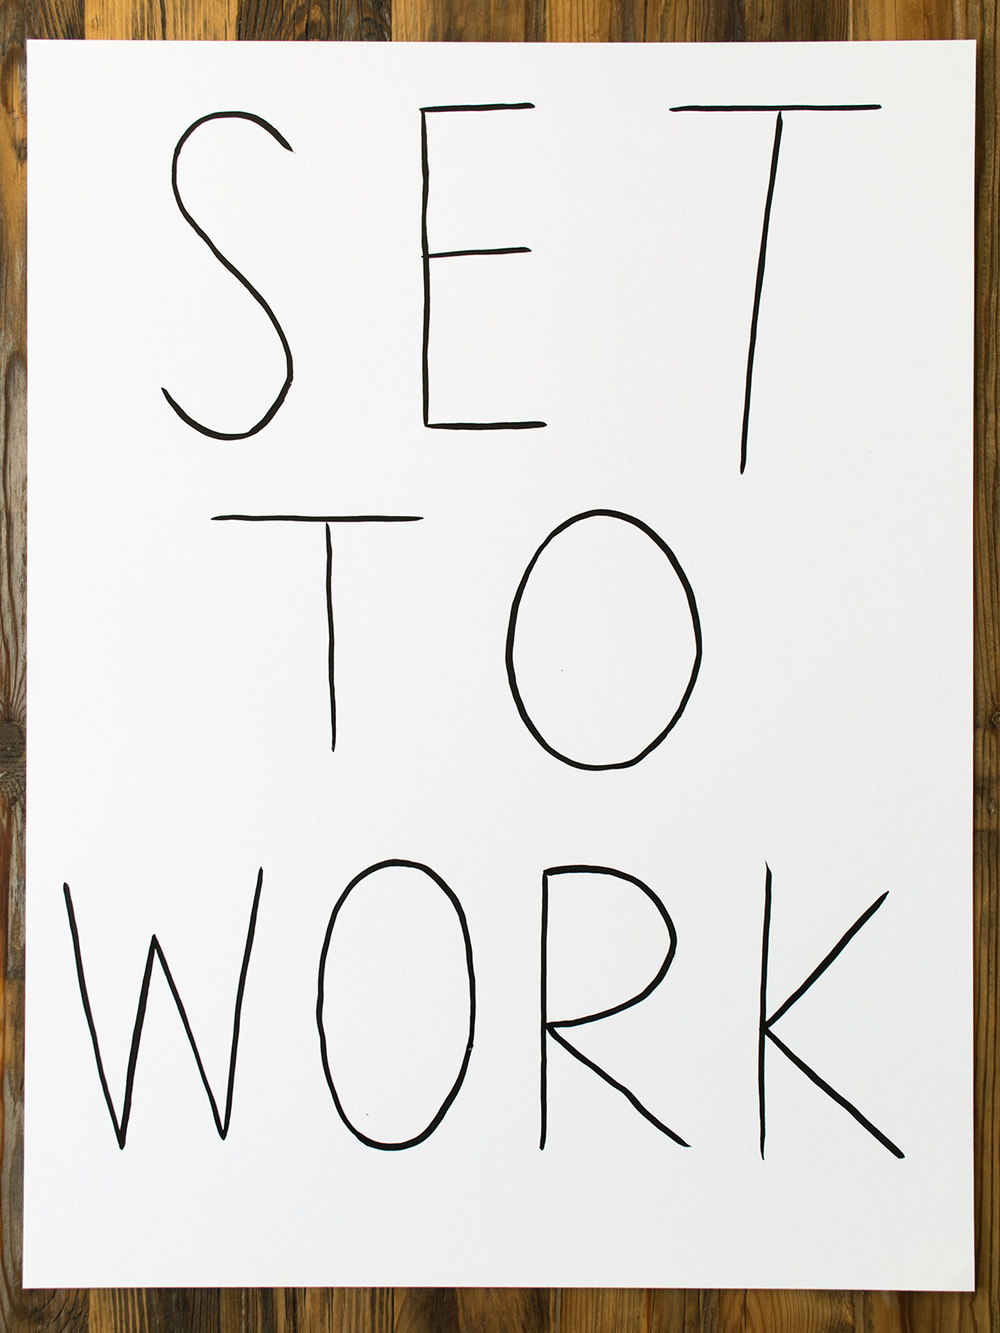 set_to_work-1500x1125.jpg